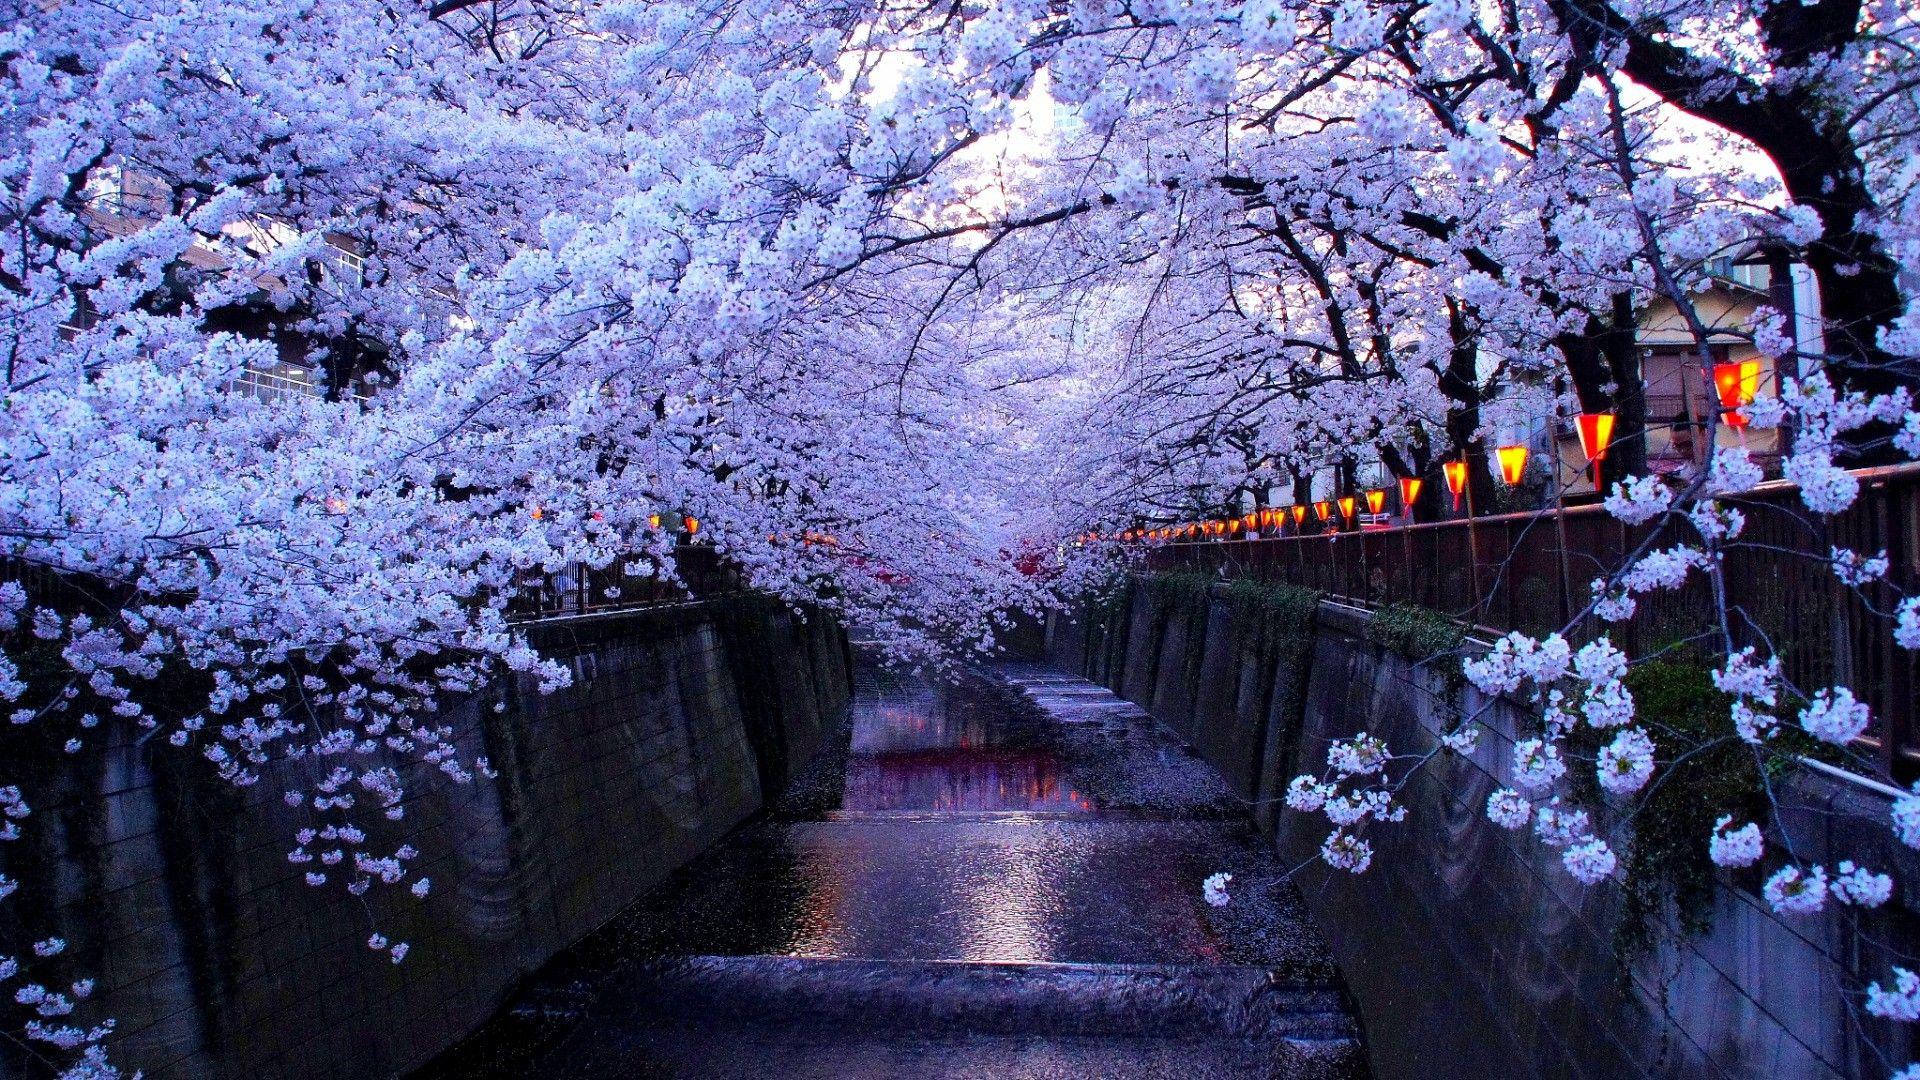 Anime Cherry Blossom Wallpaper Cherry Blossom Wallpaper Desktop 1918546 Hd Wallpaper Backgrounds Download